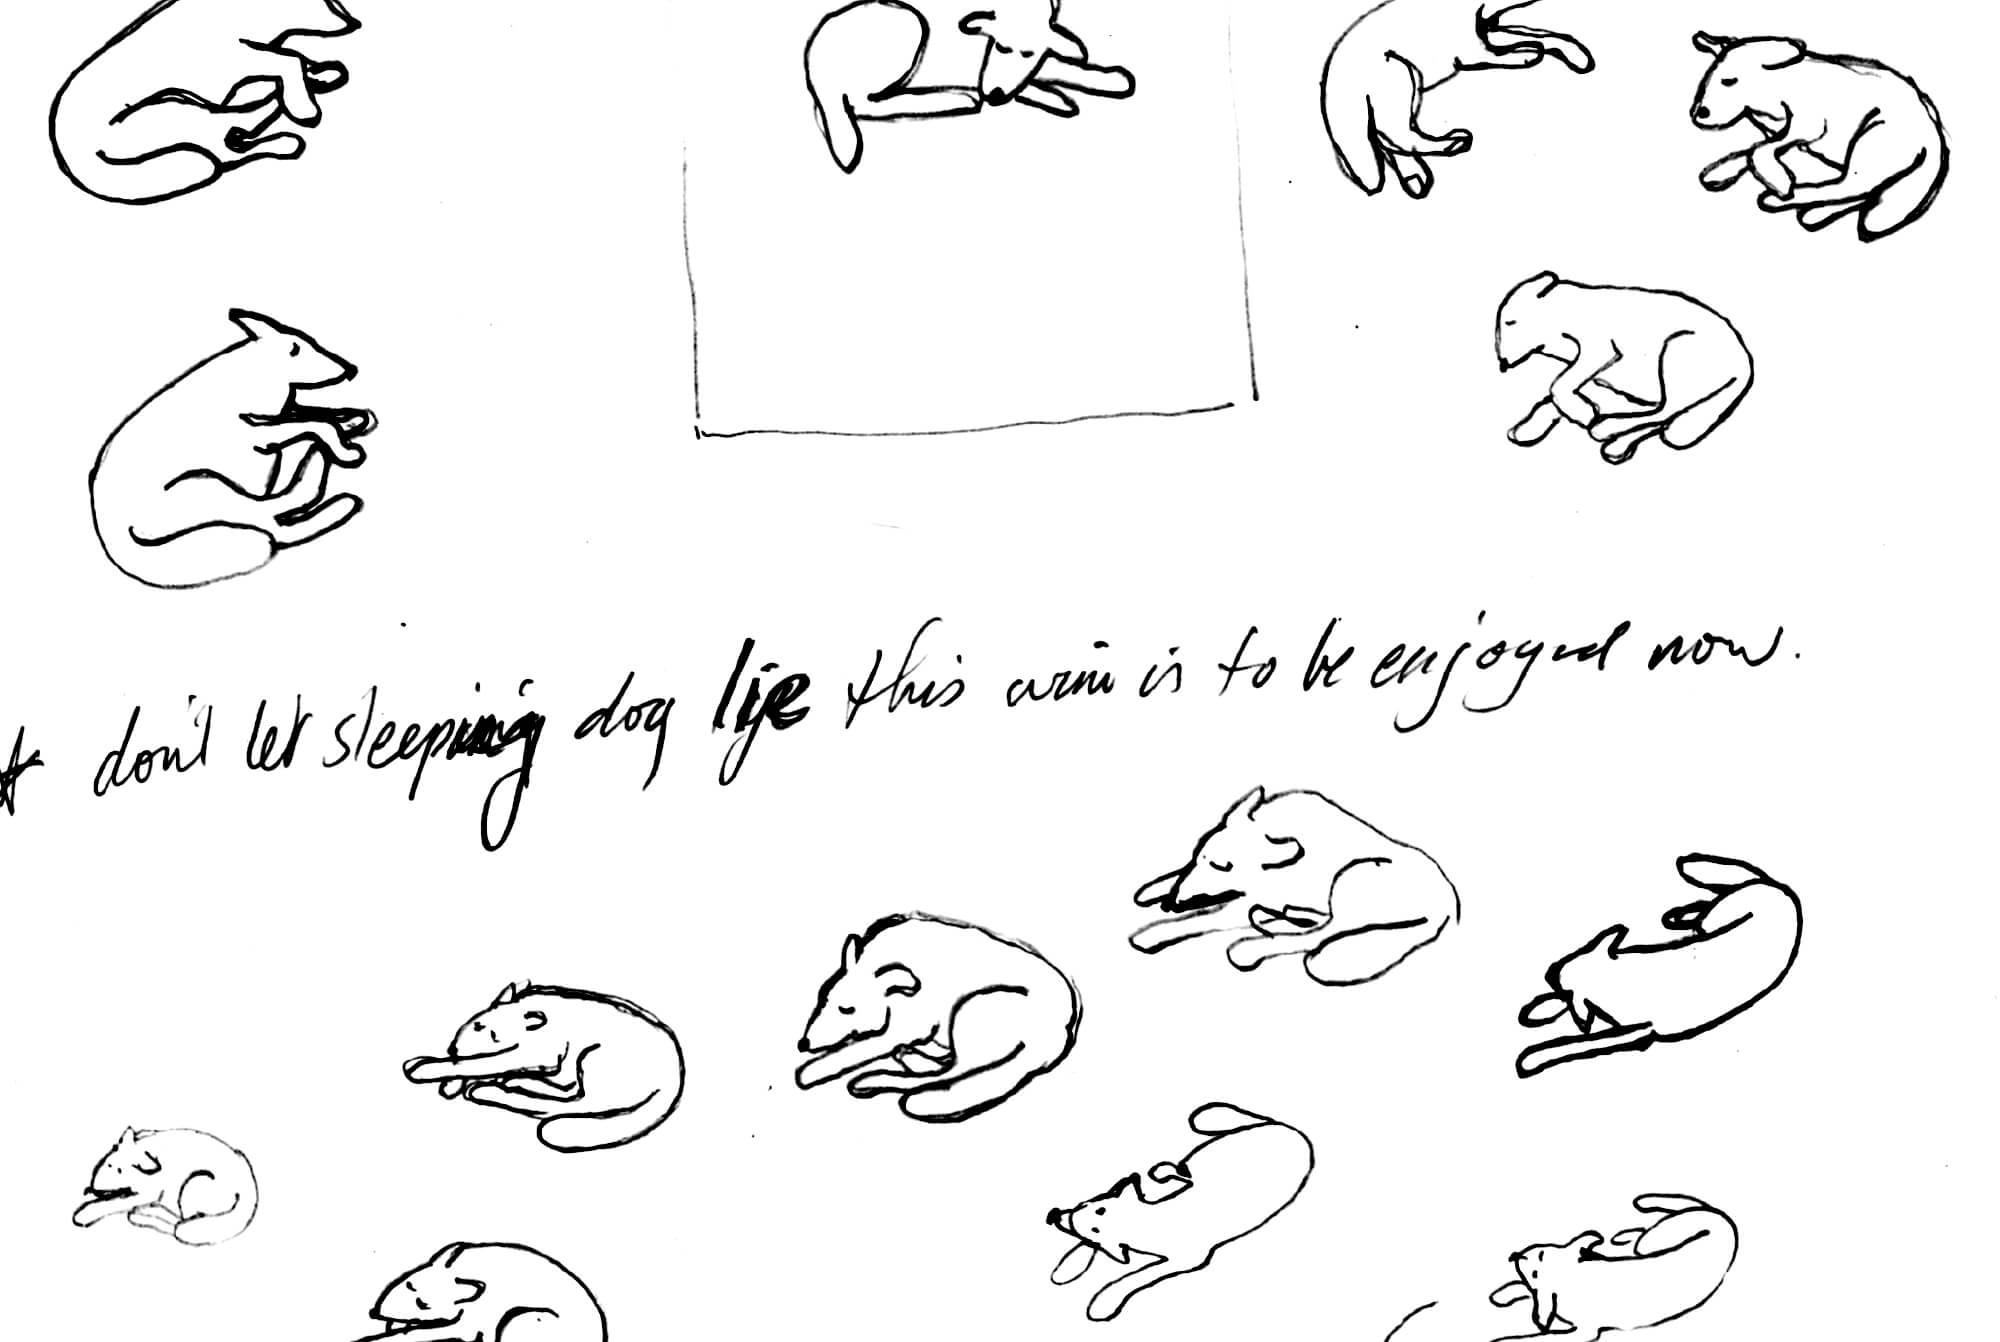 Dreamingdog_sketch